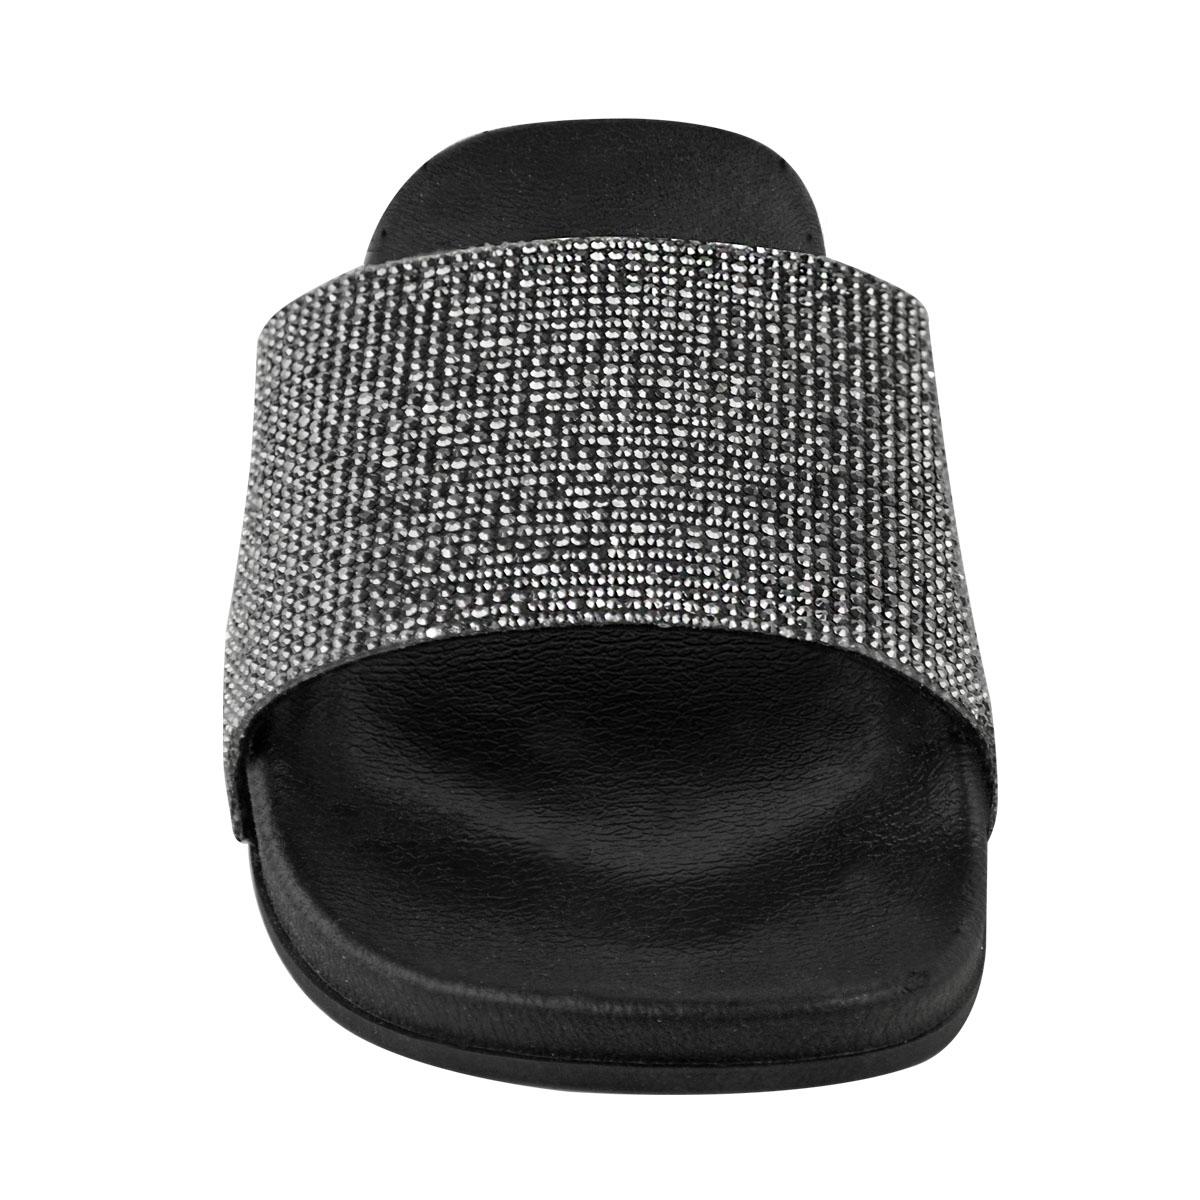 Womens Ladies Slip On Sliders Flat Diamante Sandals Rubber Mule Comfy Shoes Size